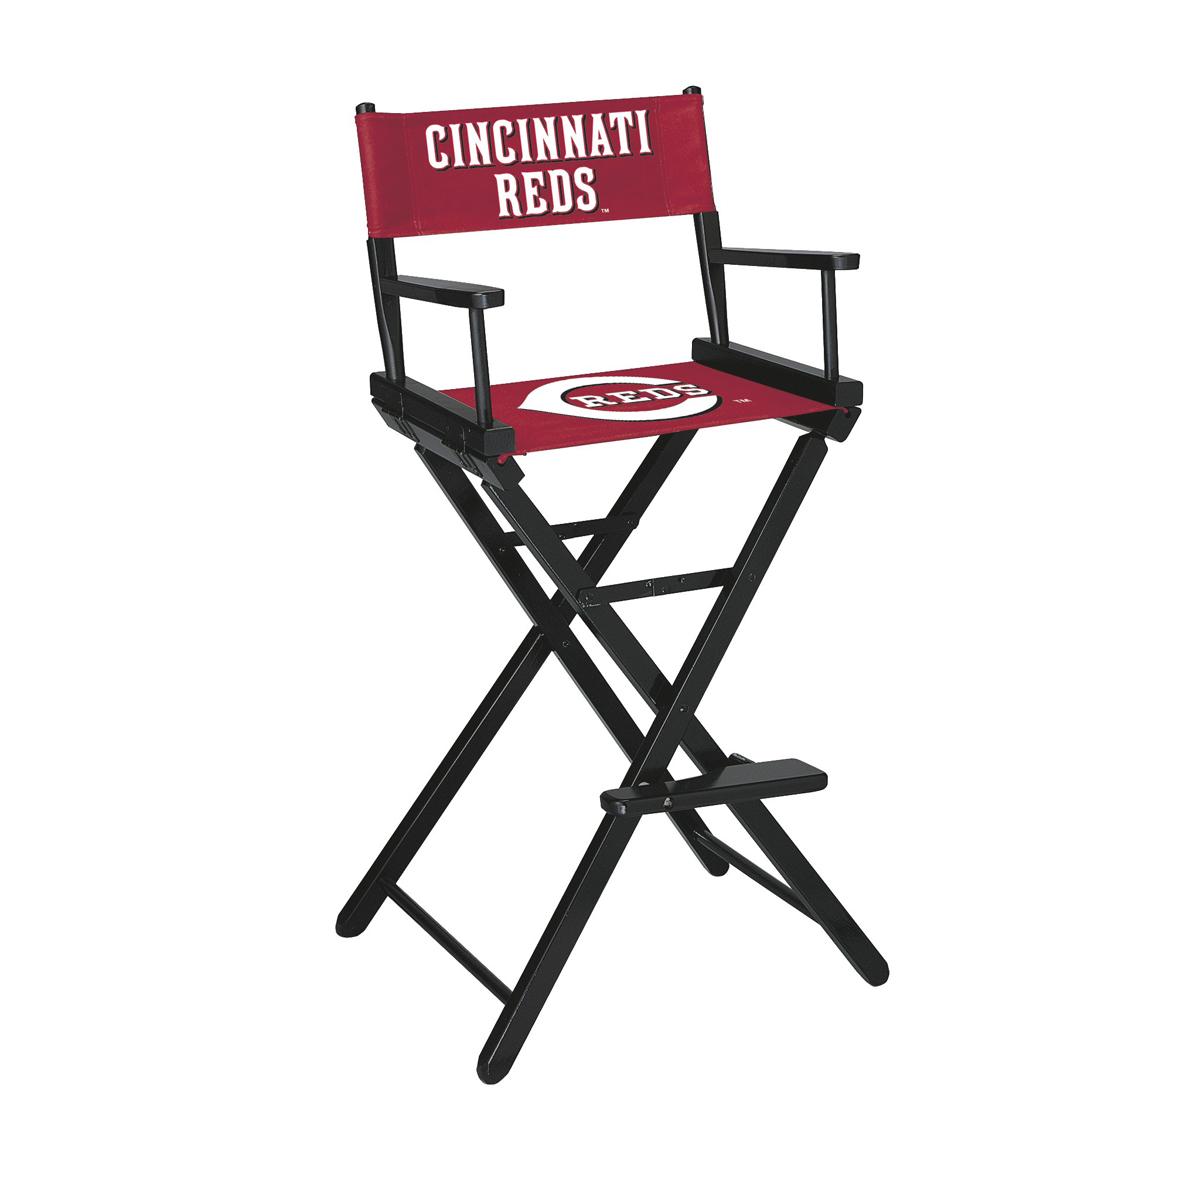 CINCINNATI REDS BAR HEIGHT DIRECTORS CHAIR